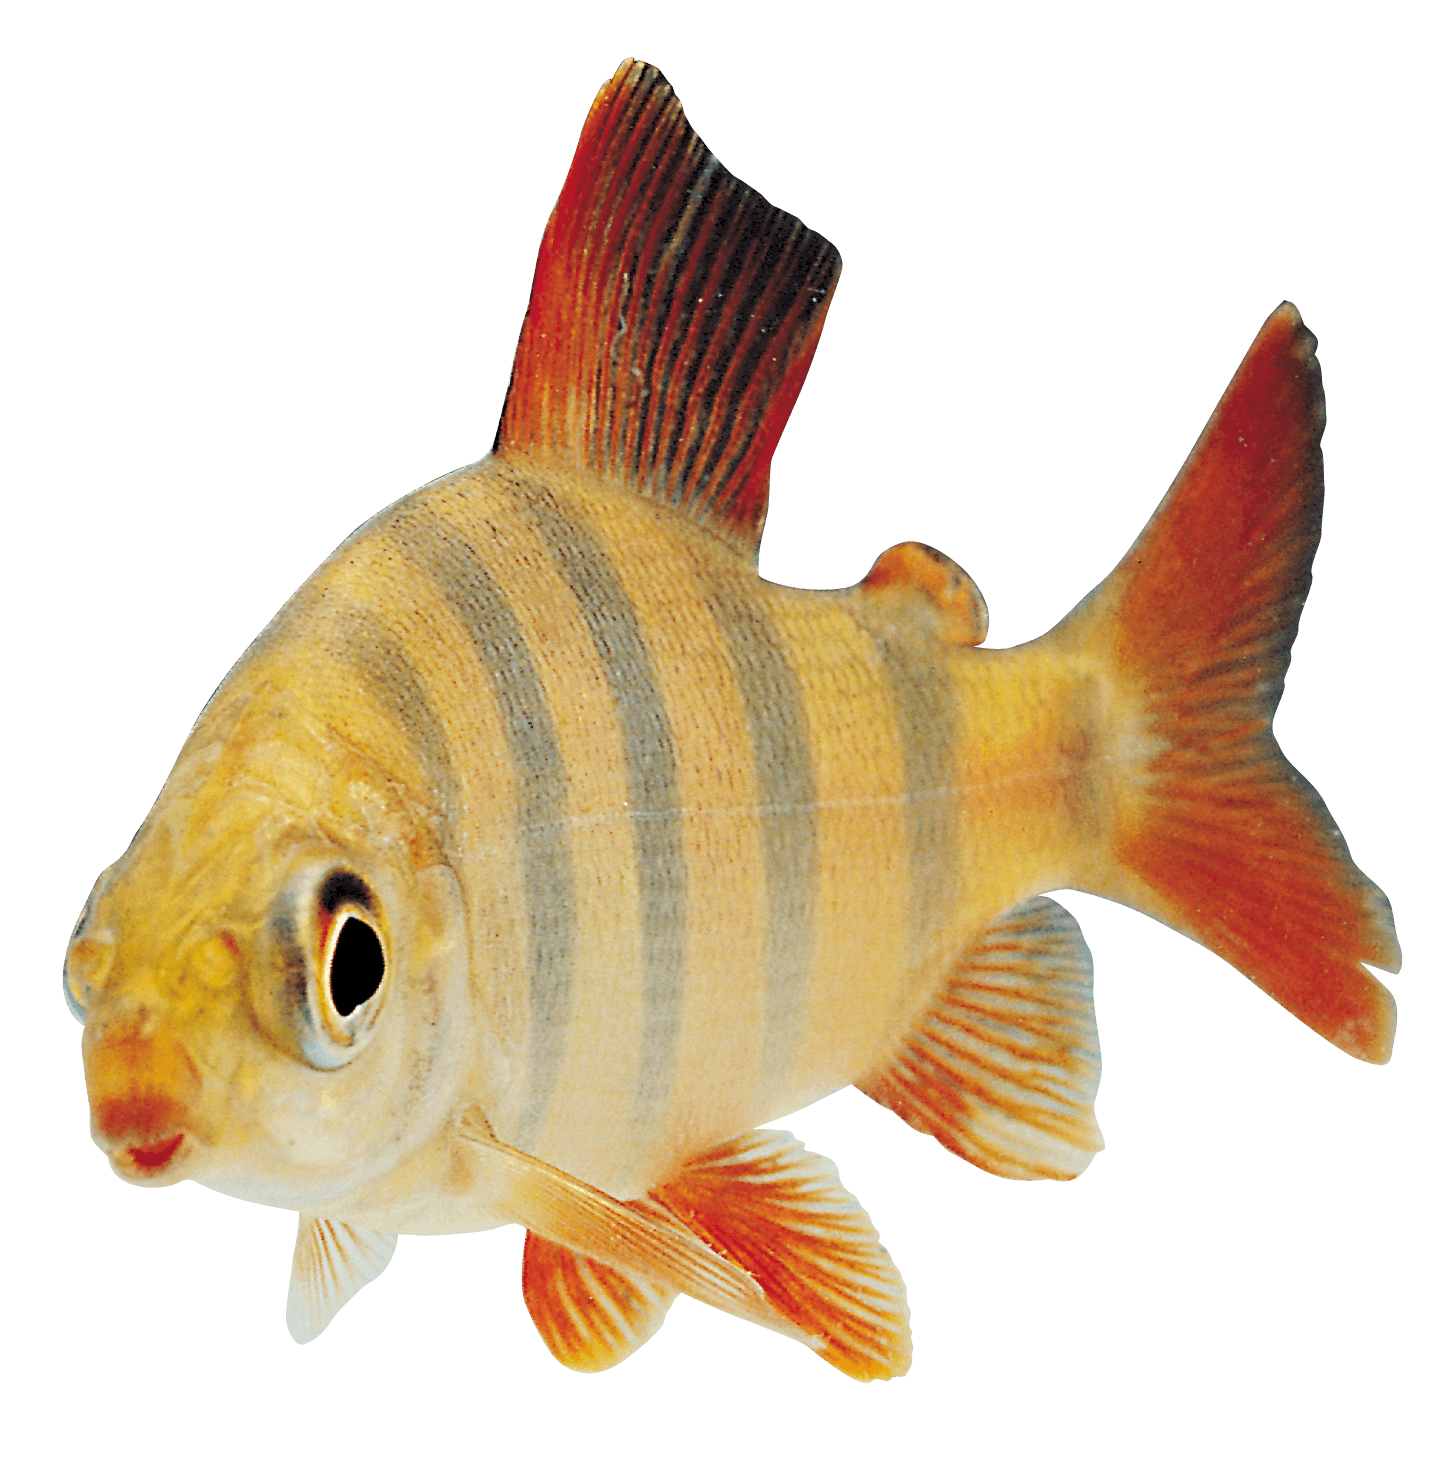 Fish Orange Sideview Transparent Png Stickpng